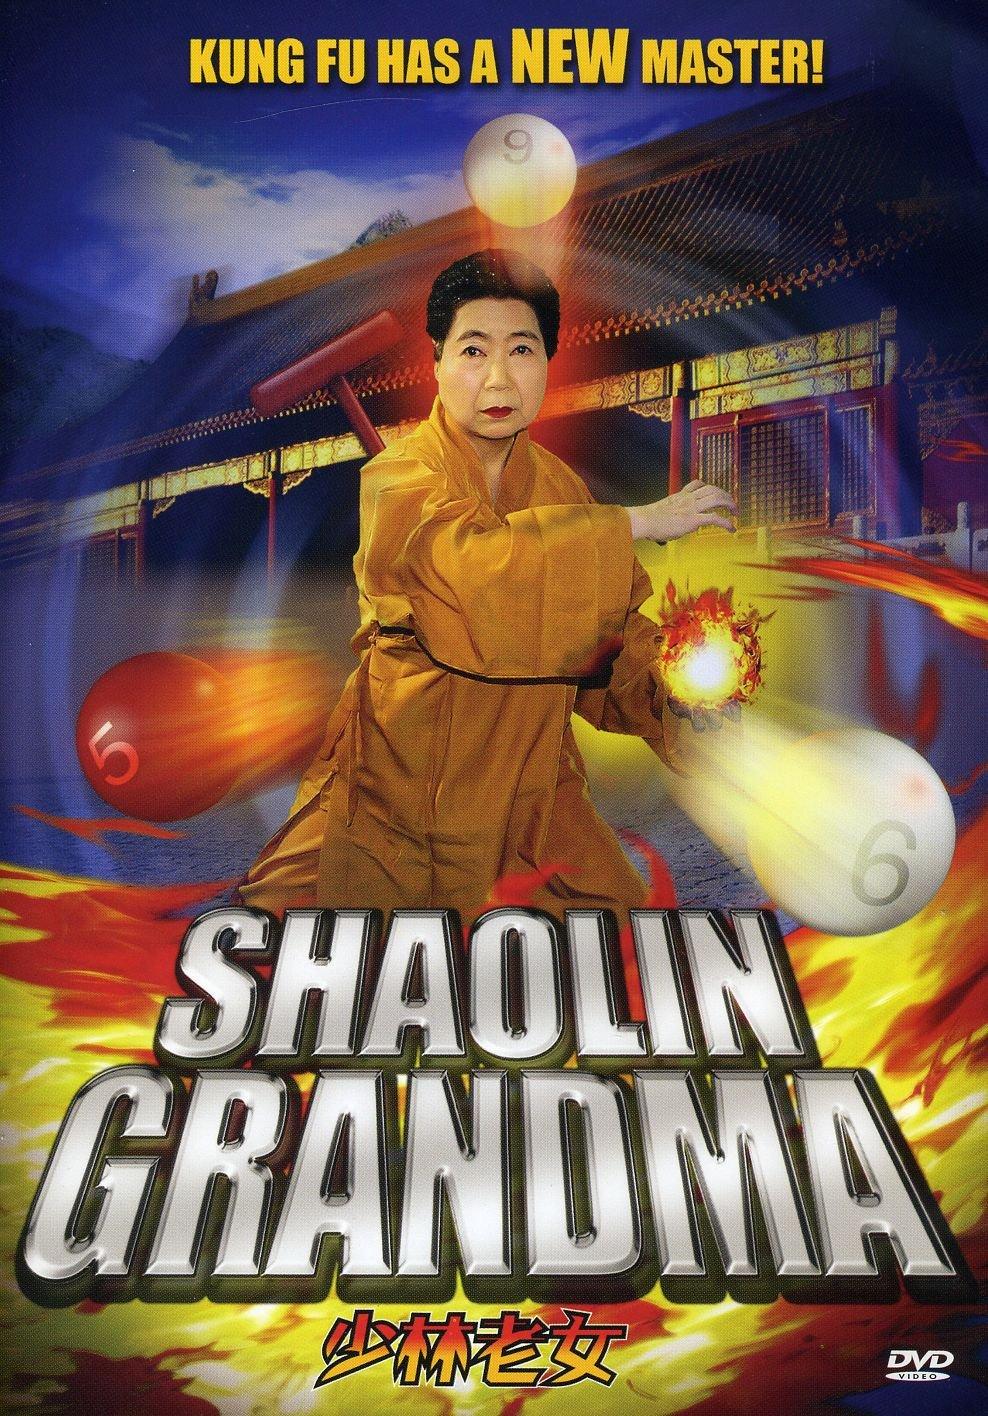 Amazon.com: Shaolin Grandma: Chiyako Asami, Nao Nagasawa, Kotaro ...